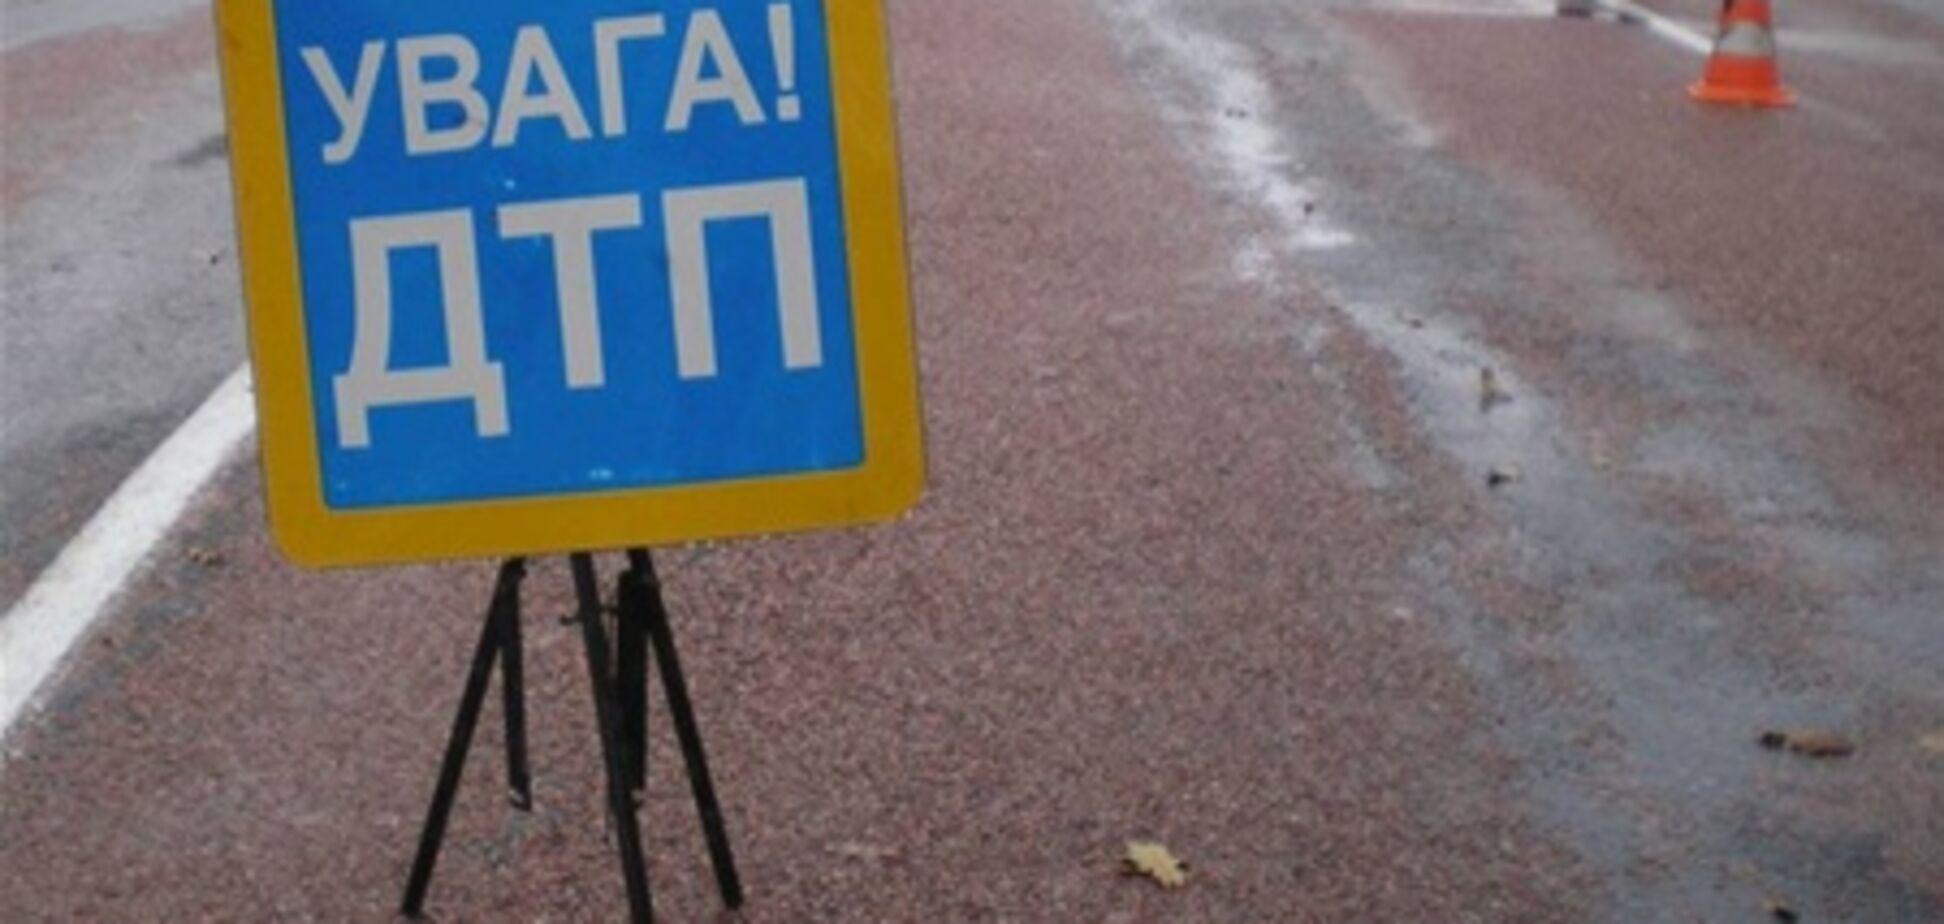 Двое граждан Беларуси погибли в ДТП на Черниговщине